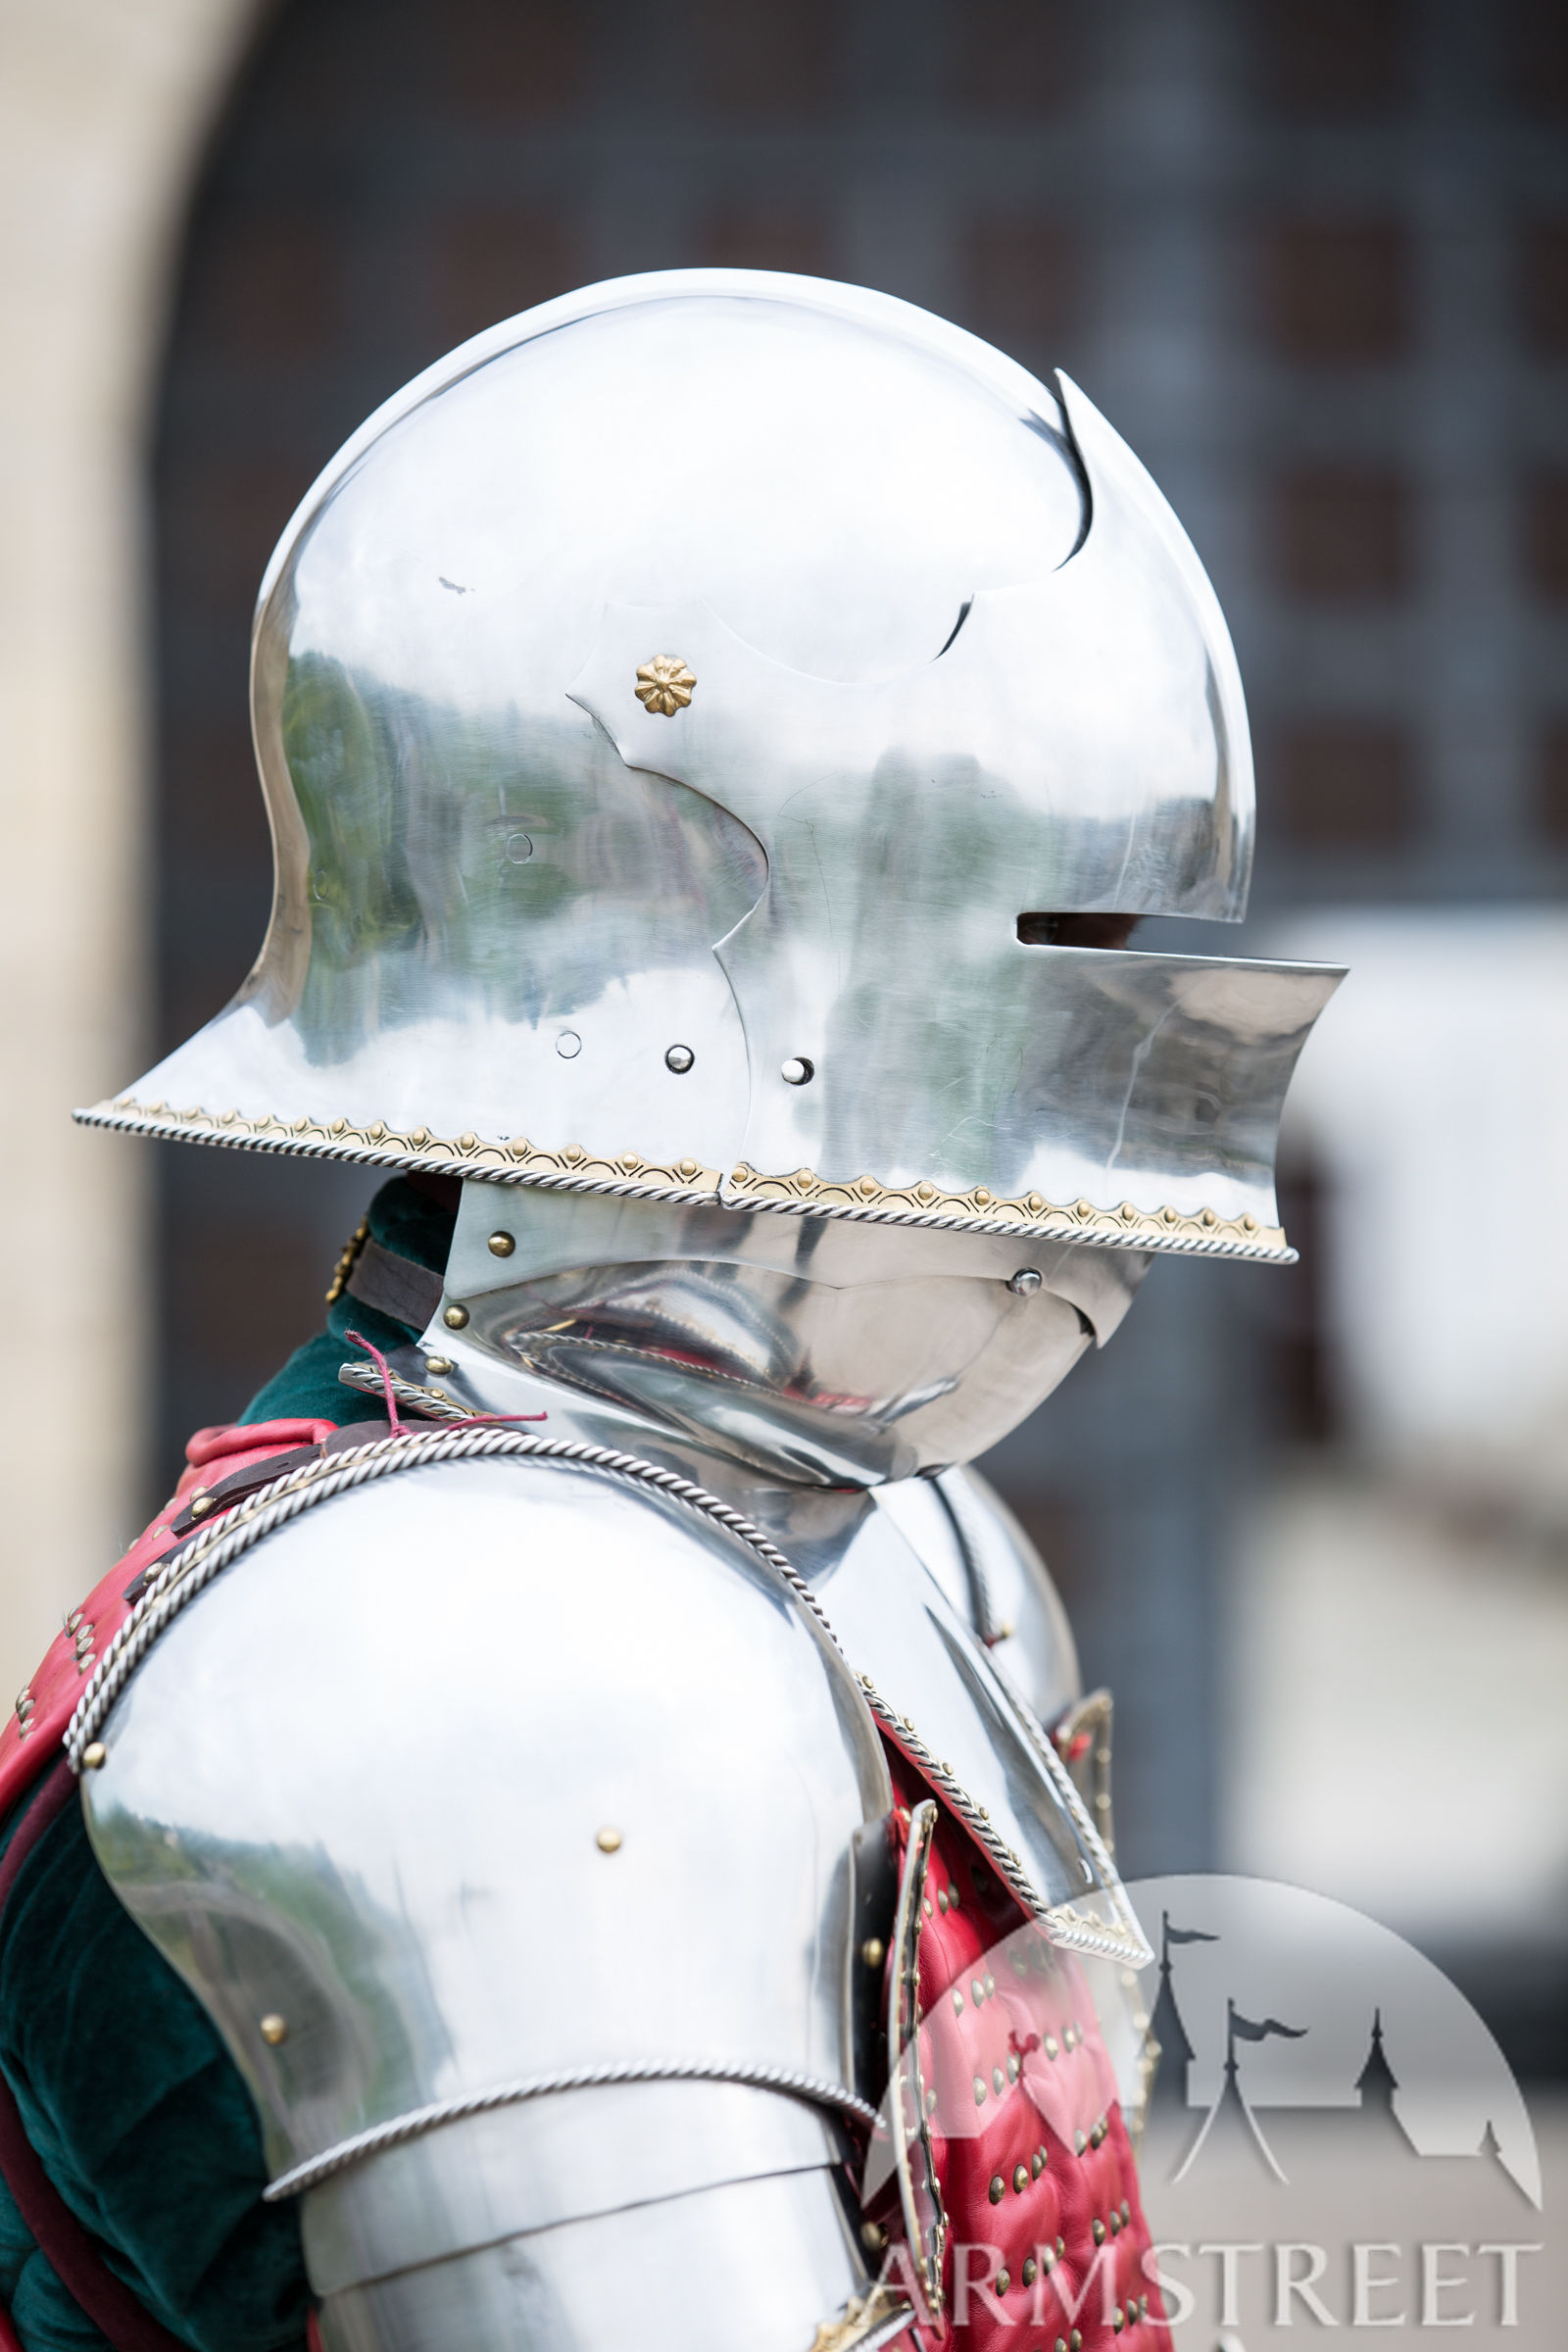 Historical Armor I would Like To See - Mordhau com Forums